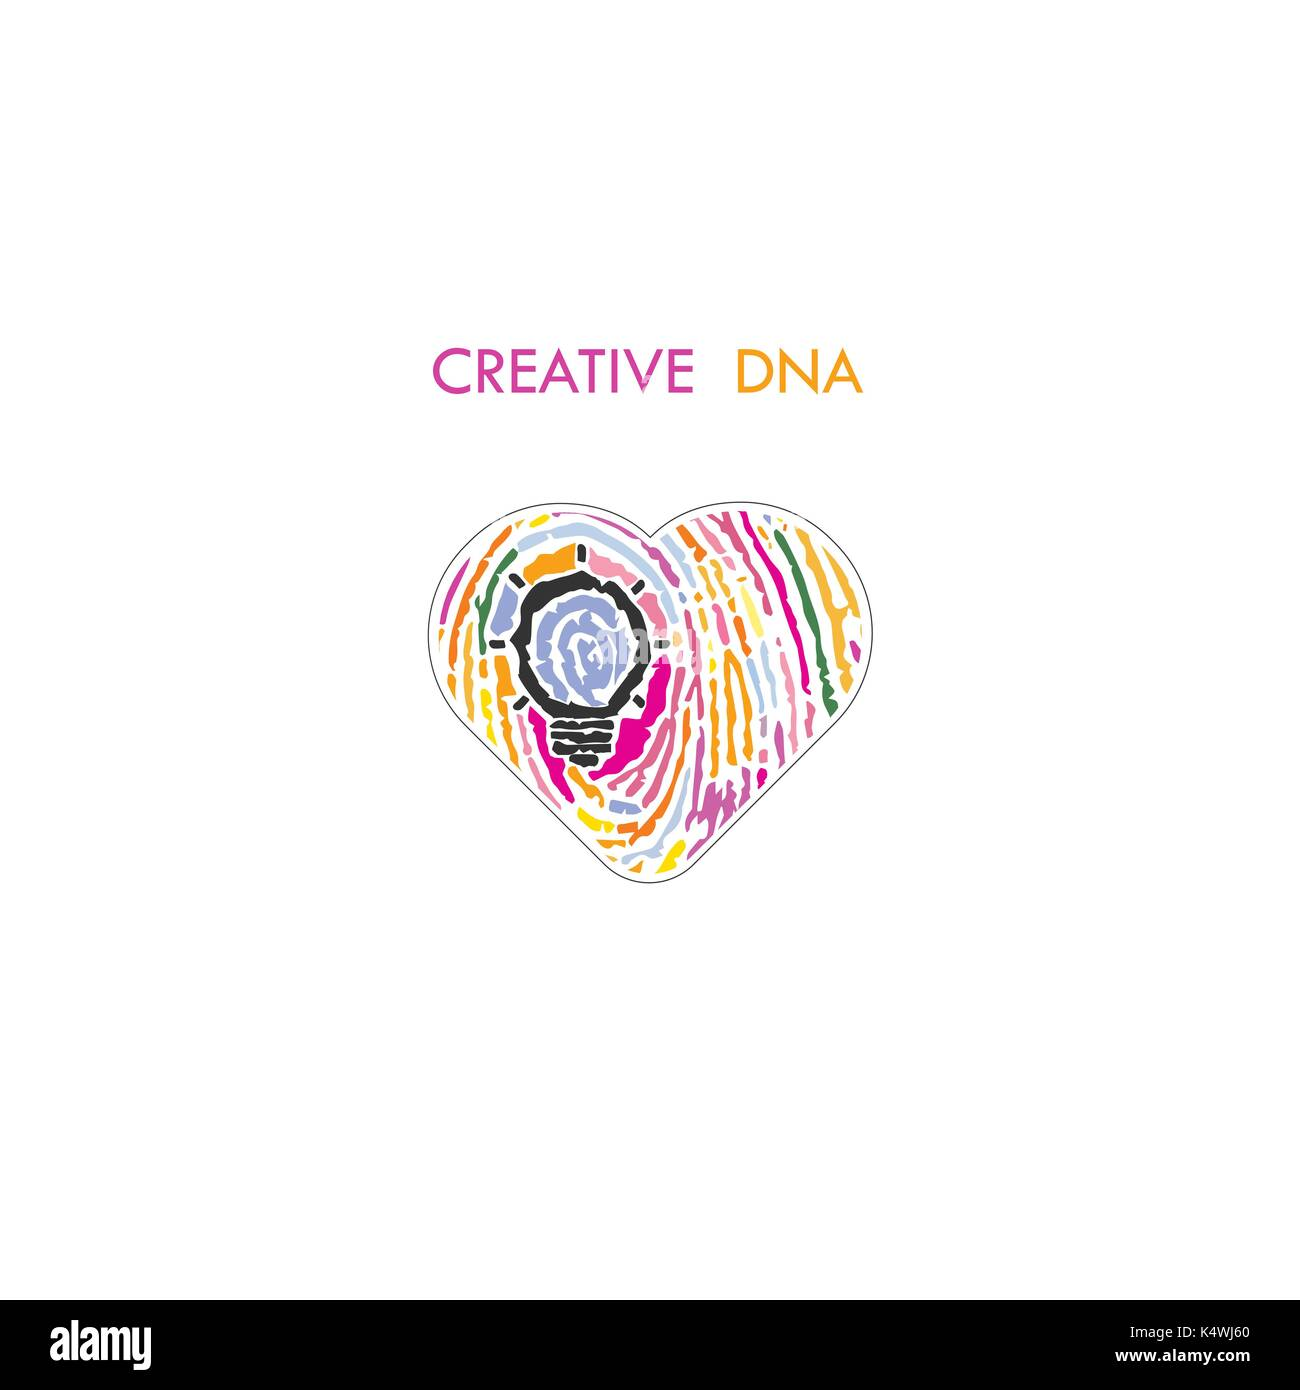 kreative glhbirne idee konzept und fingerabdruck muster mit herz bildung oder geschftsideen kreativitt oder innovation konzept constructioni - Konzept Muster